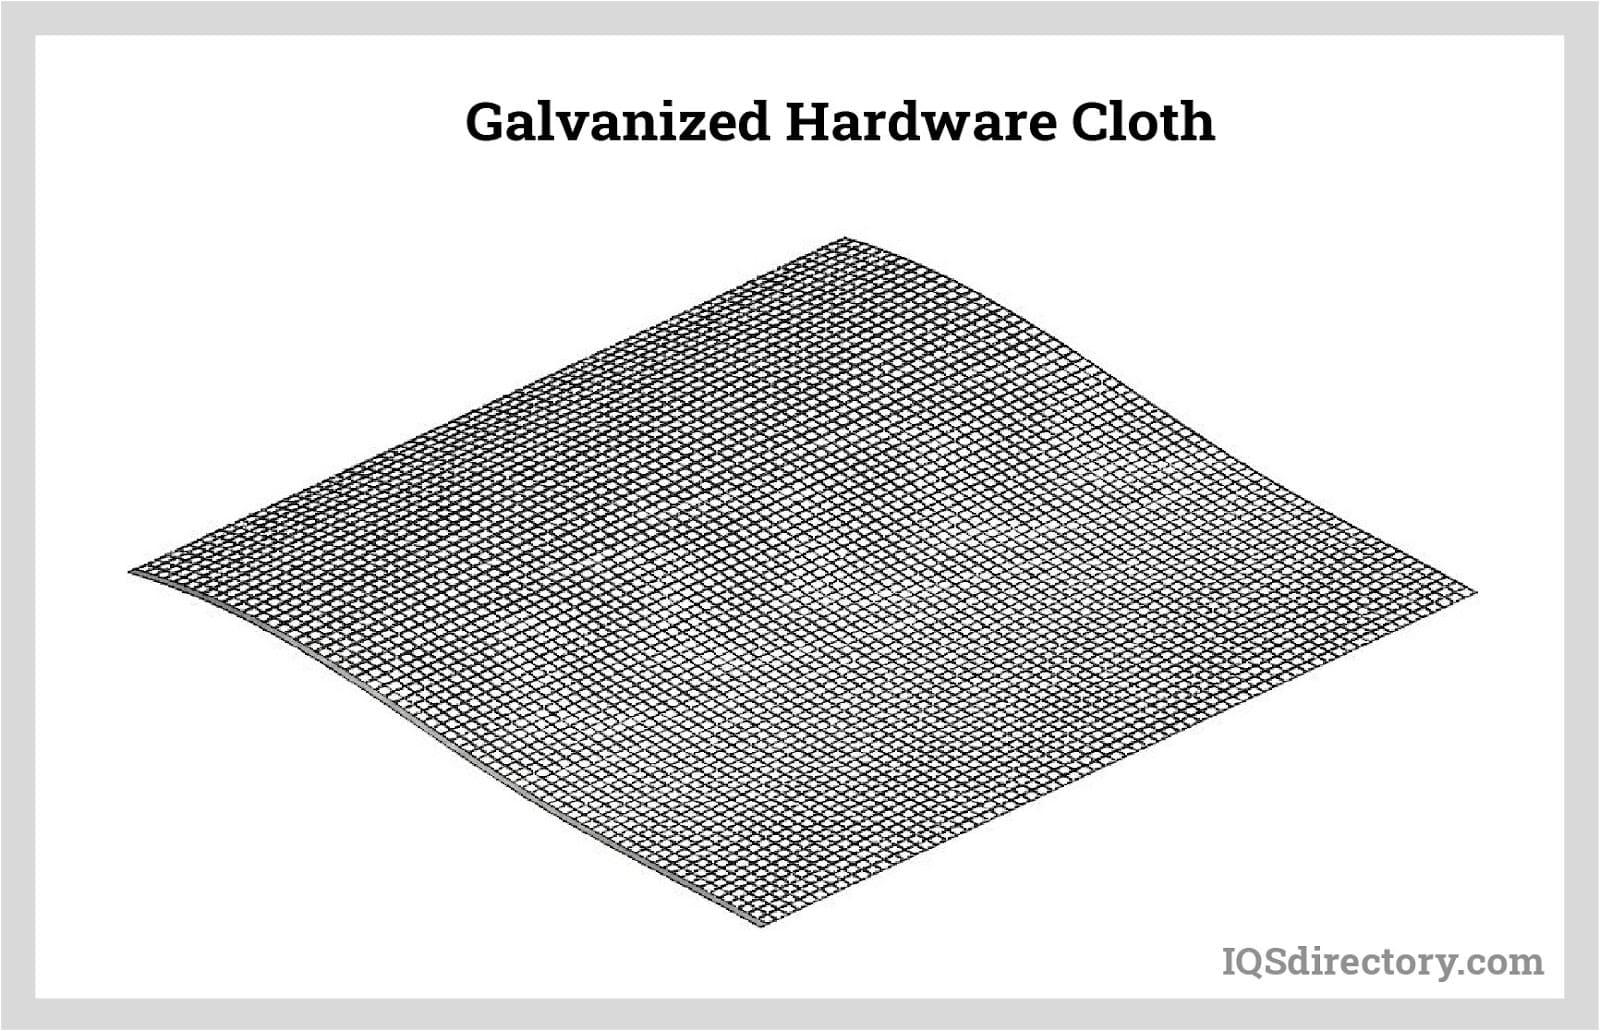 Galvanized Hardware Cloth